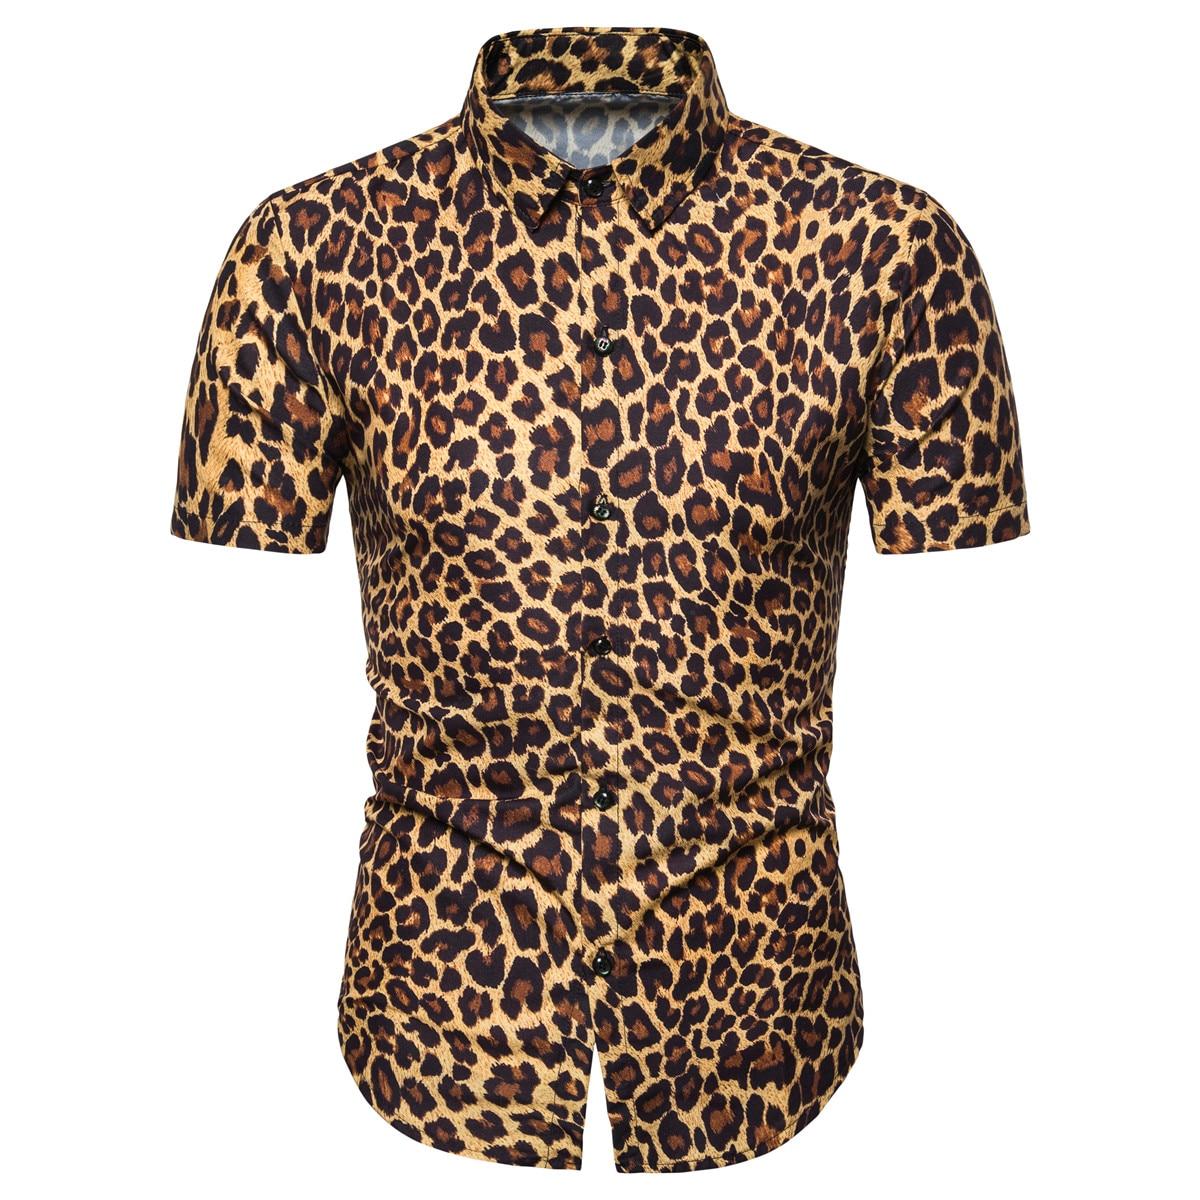 Miicoopie Mens קצר שרוול חולצות לקיץ הדפס מנומר מזדמן אופנה גברים חולצות